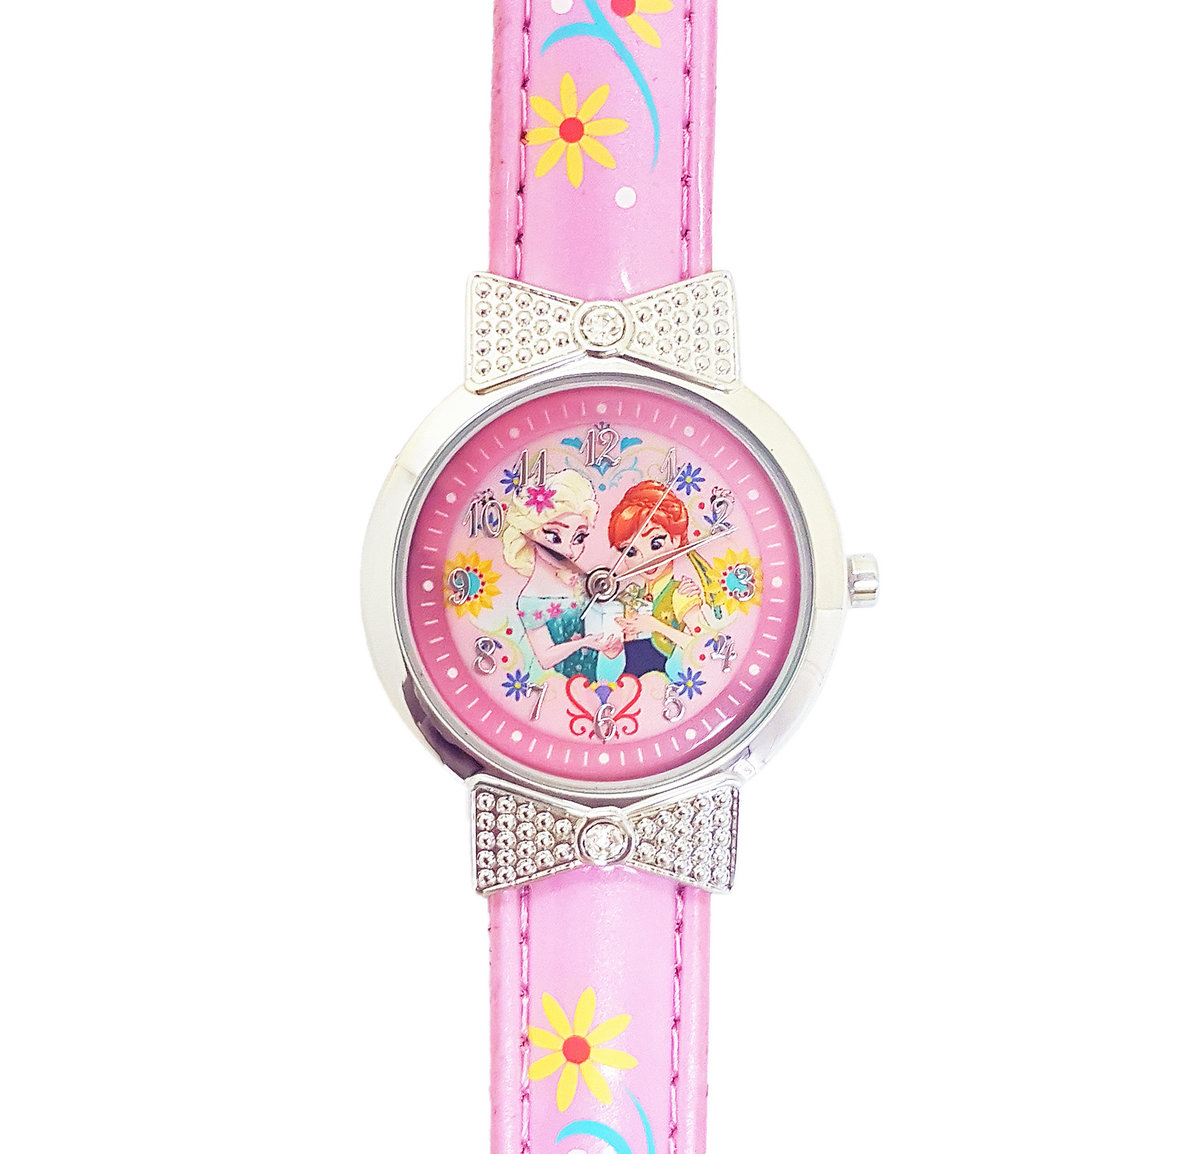 DISNEY FROZEN - Kids wrist watch - Pink color (Licensed by Disney)